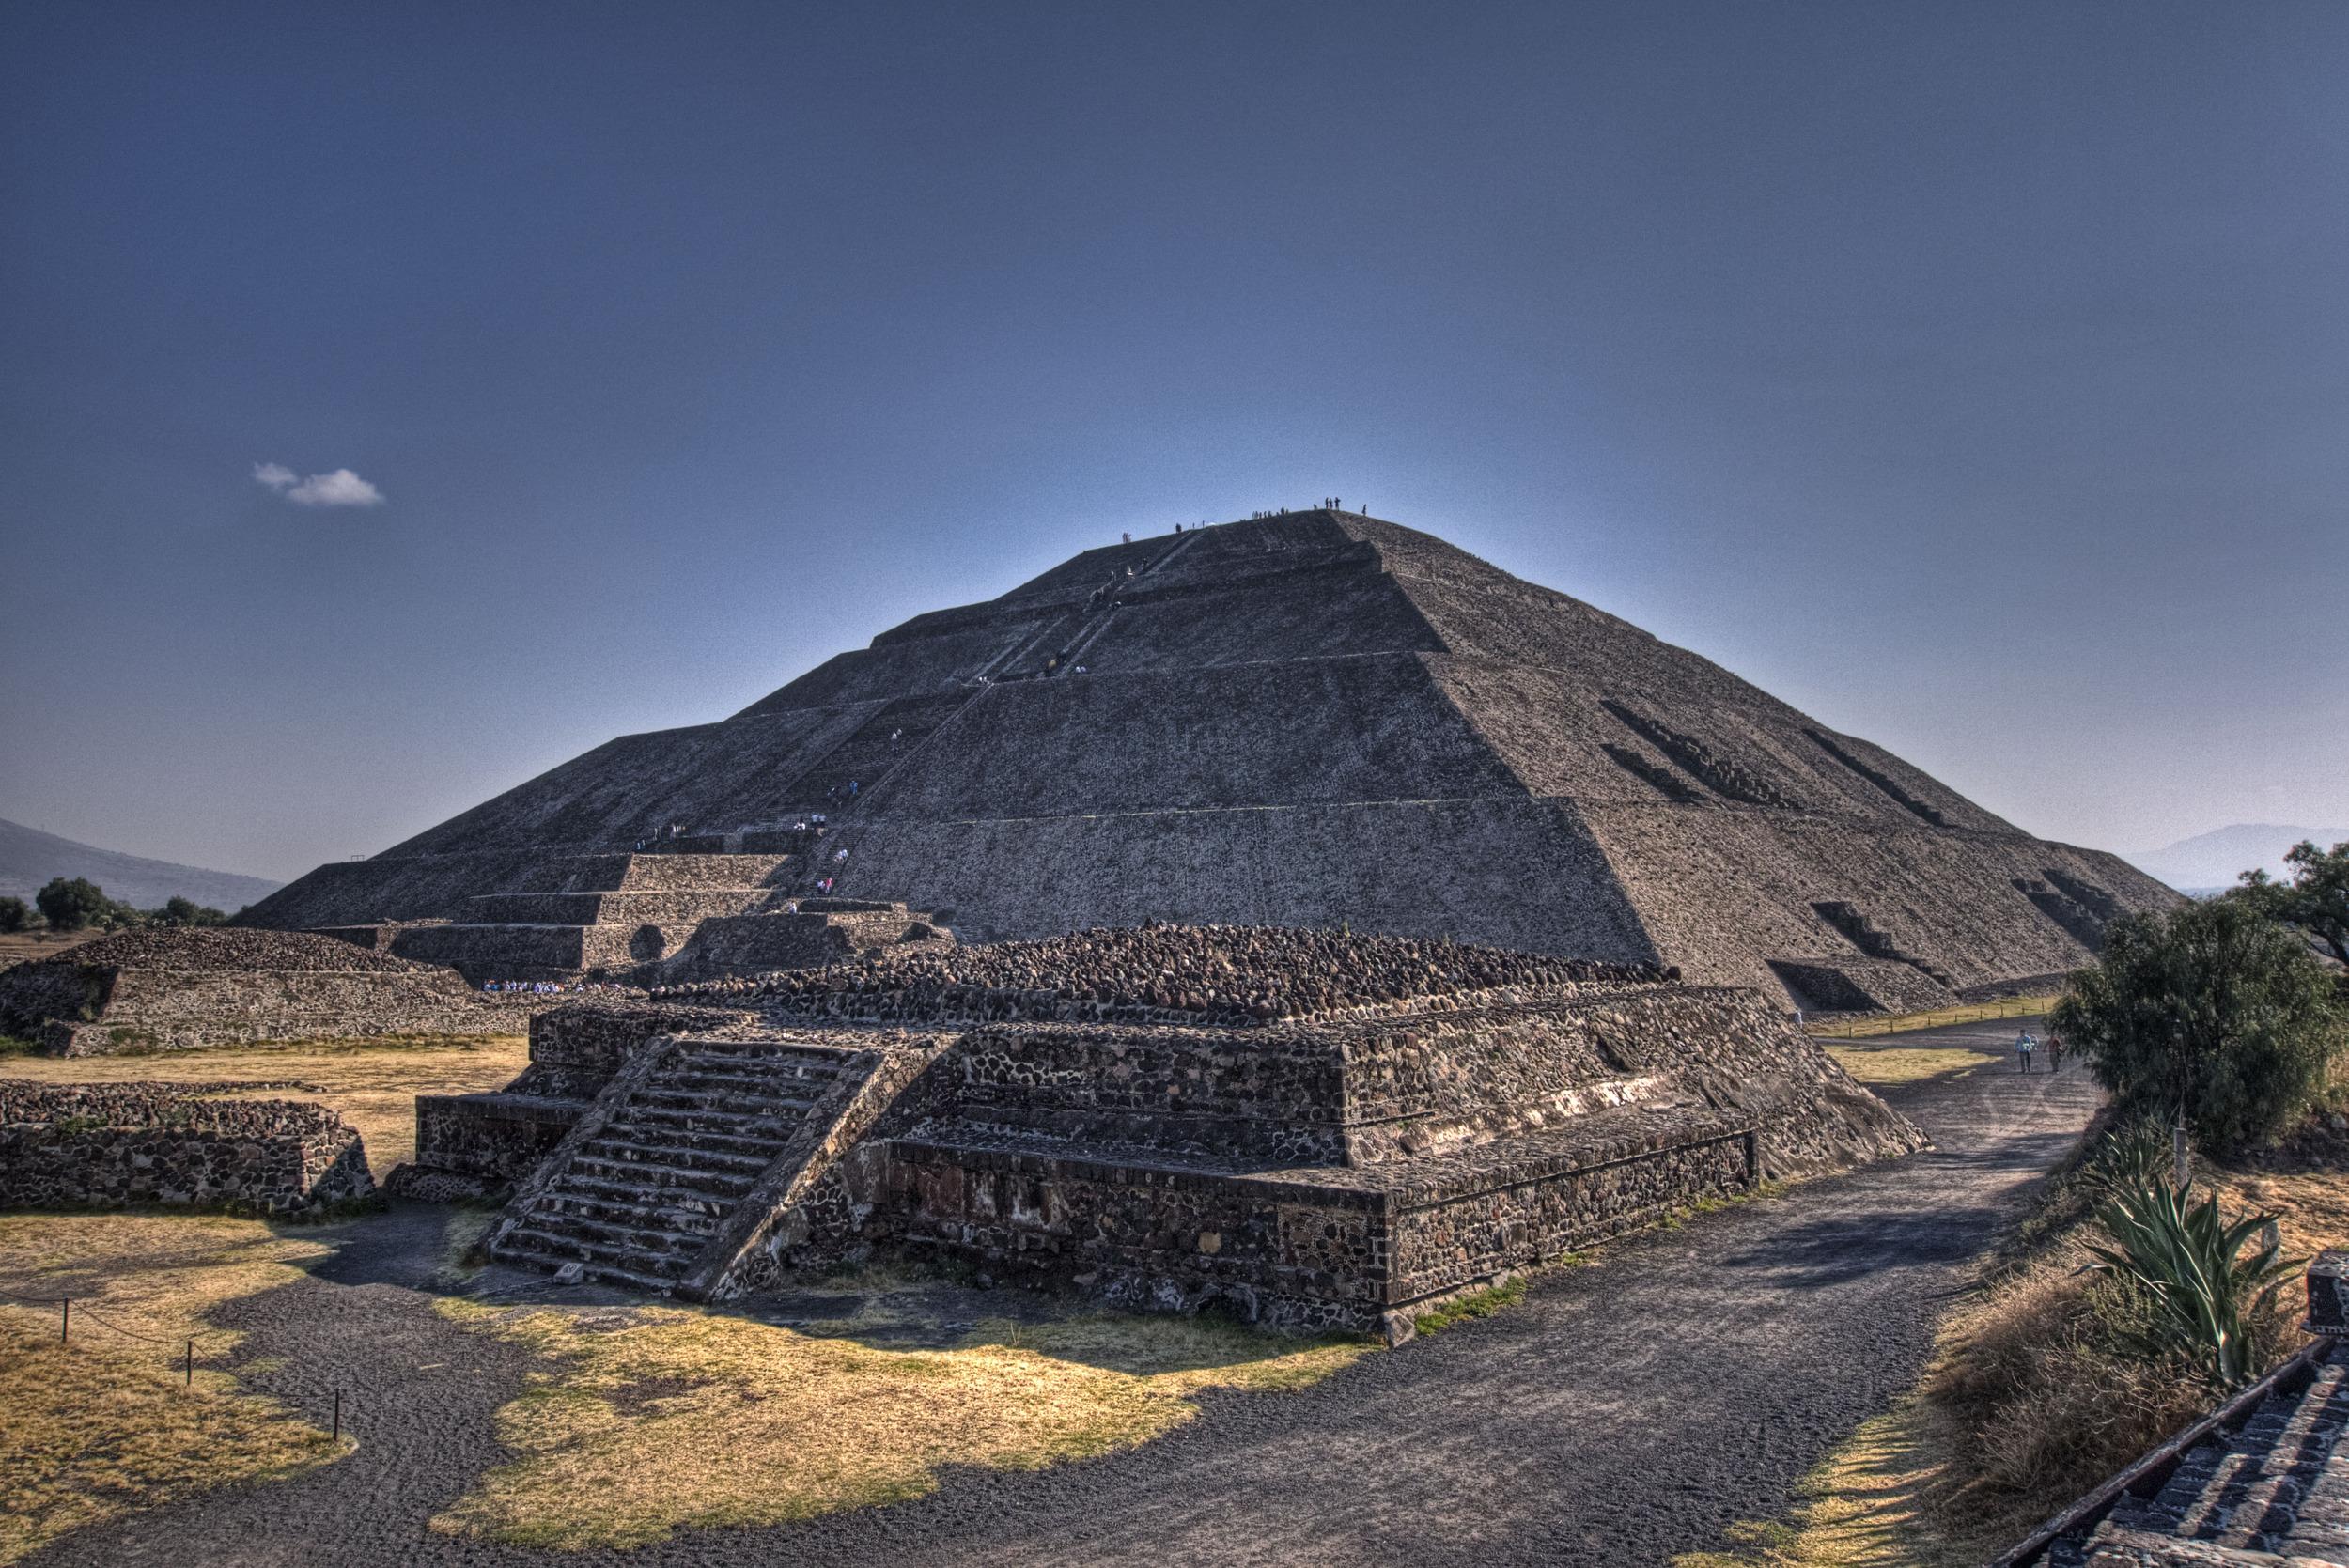 A pyramid, Latin American style.